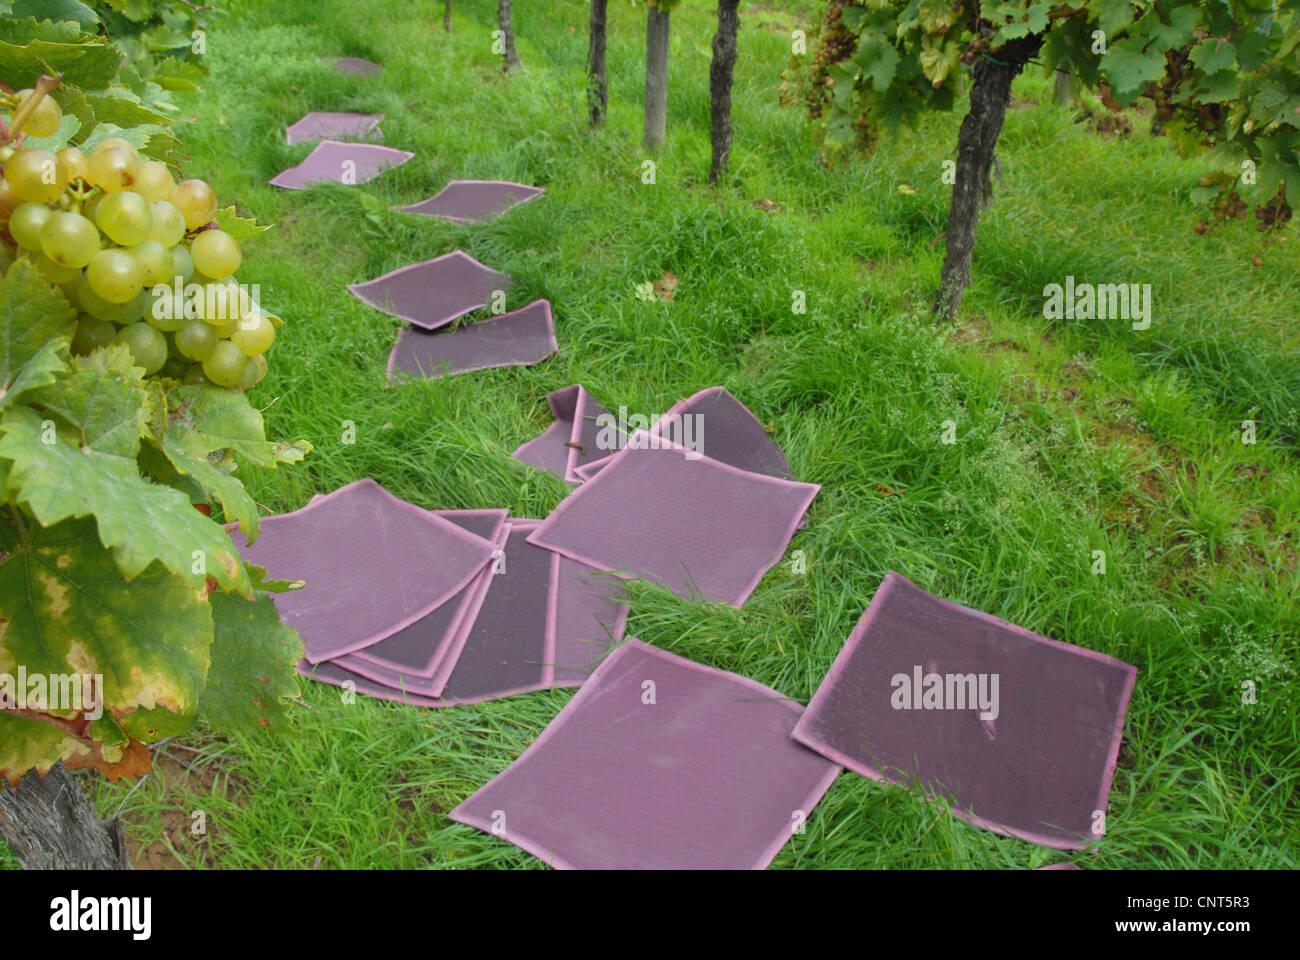 vineyard with wine filters, Germany, Rhineland-Palatinate - Stock Image